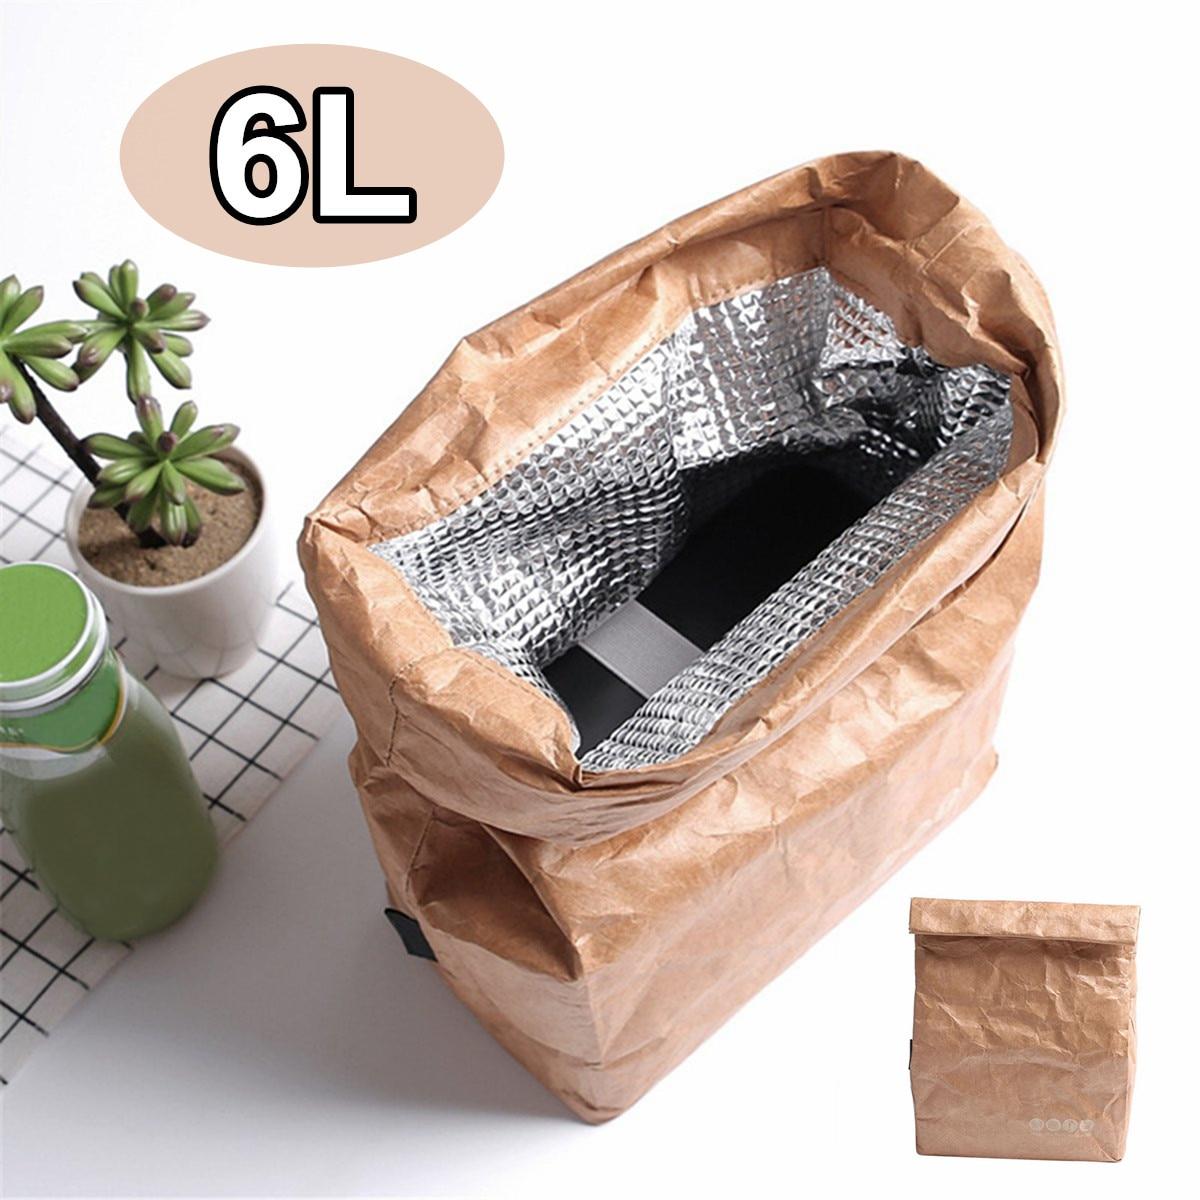 6L Kraft Paper Lunch Bags For Women Men Environment Waterproof Insulated Cooler Bags Thermal Aluminum Foldable Picnic Bags